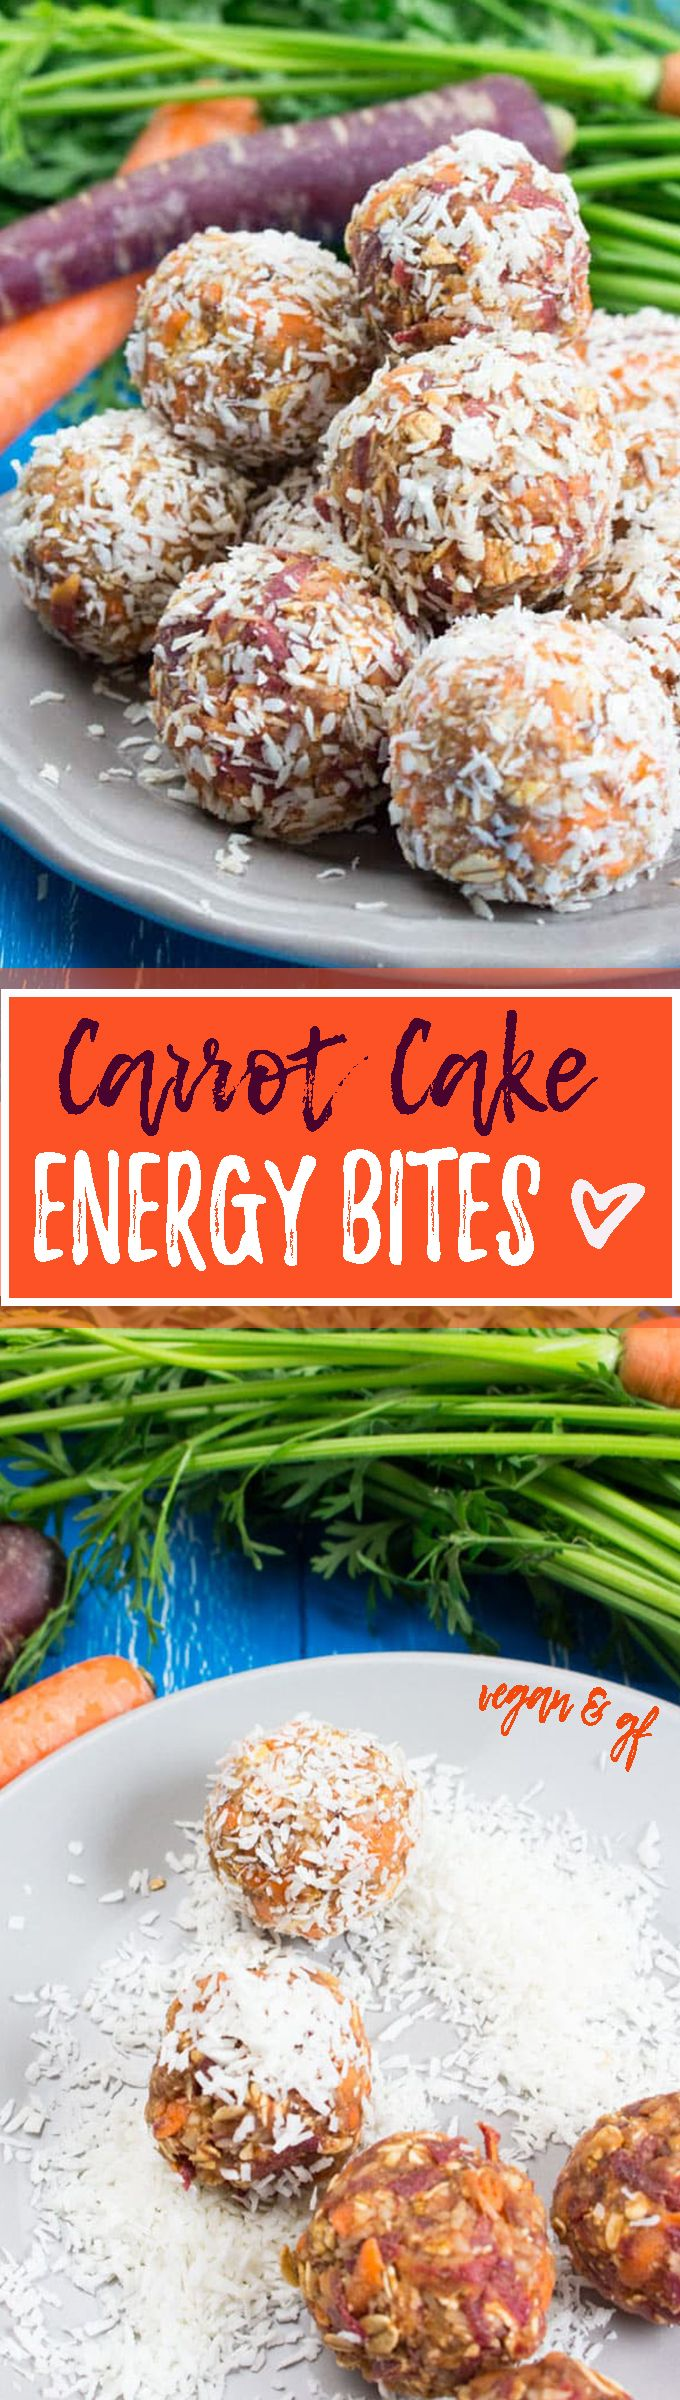 Photo of Carrot Cake Energy Balls